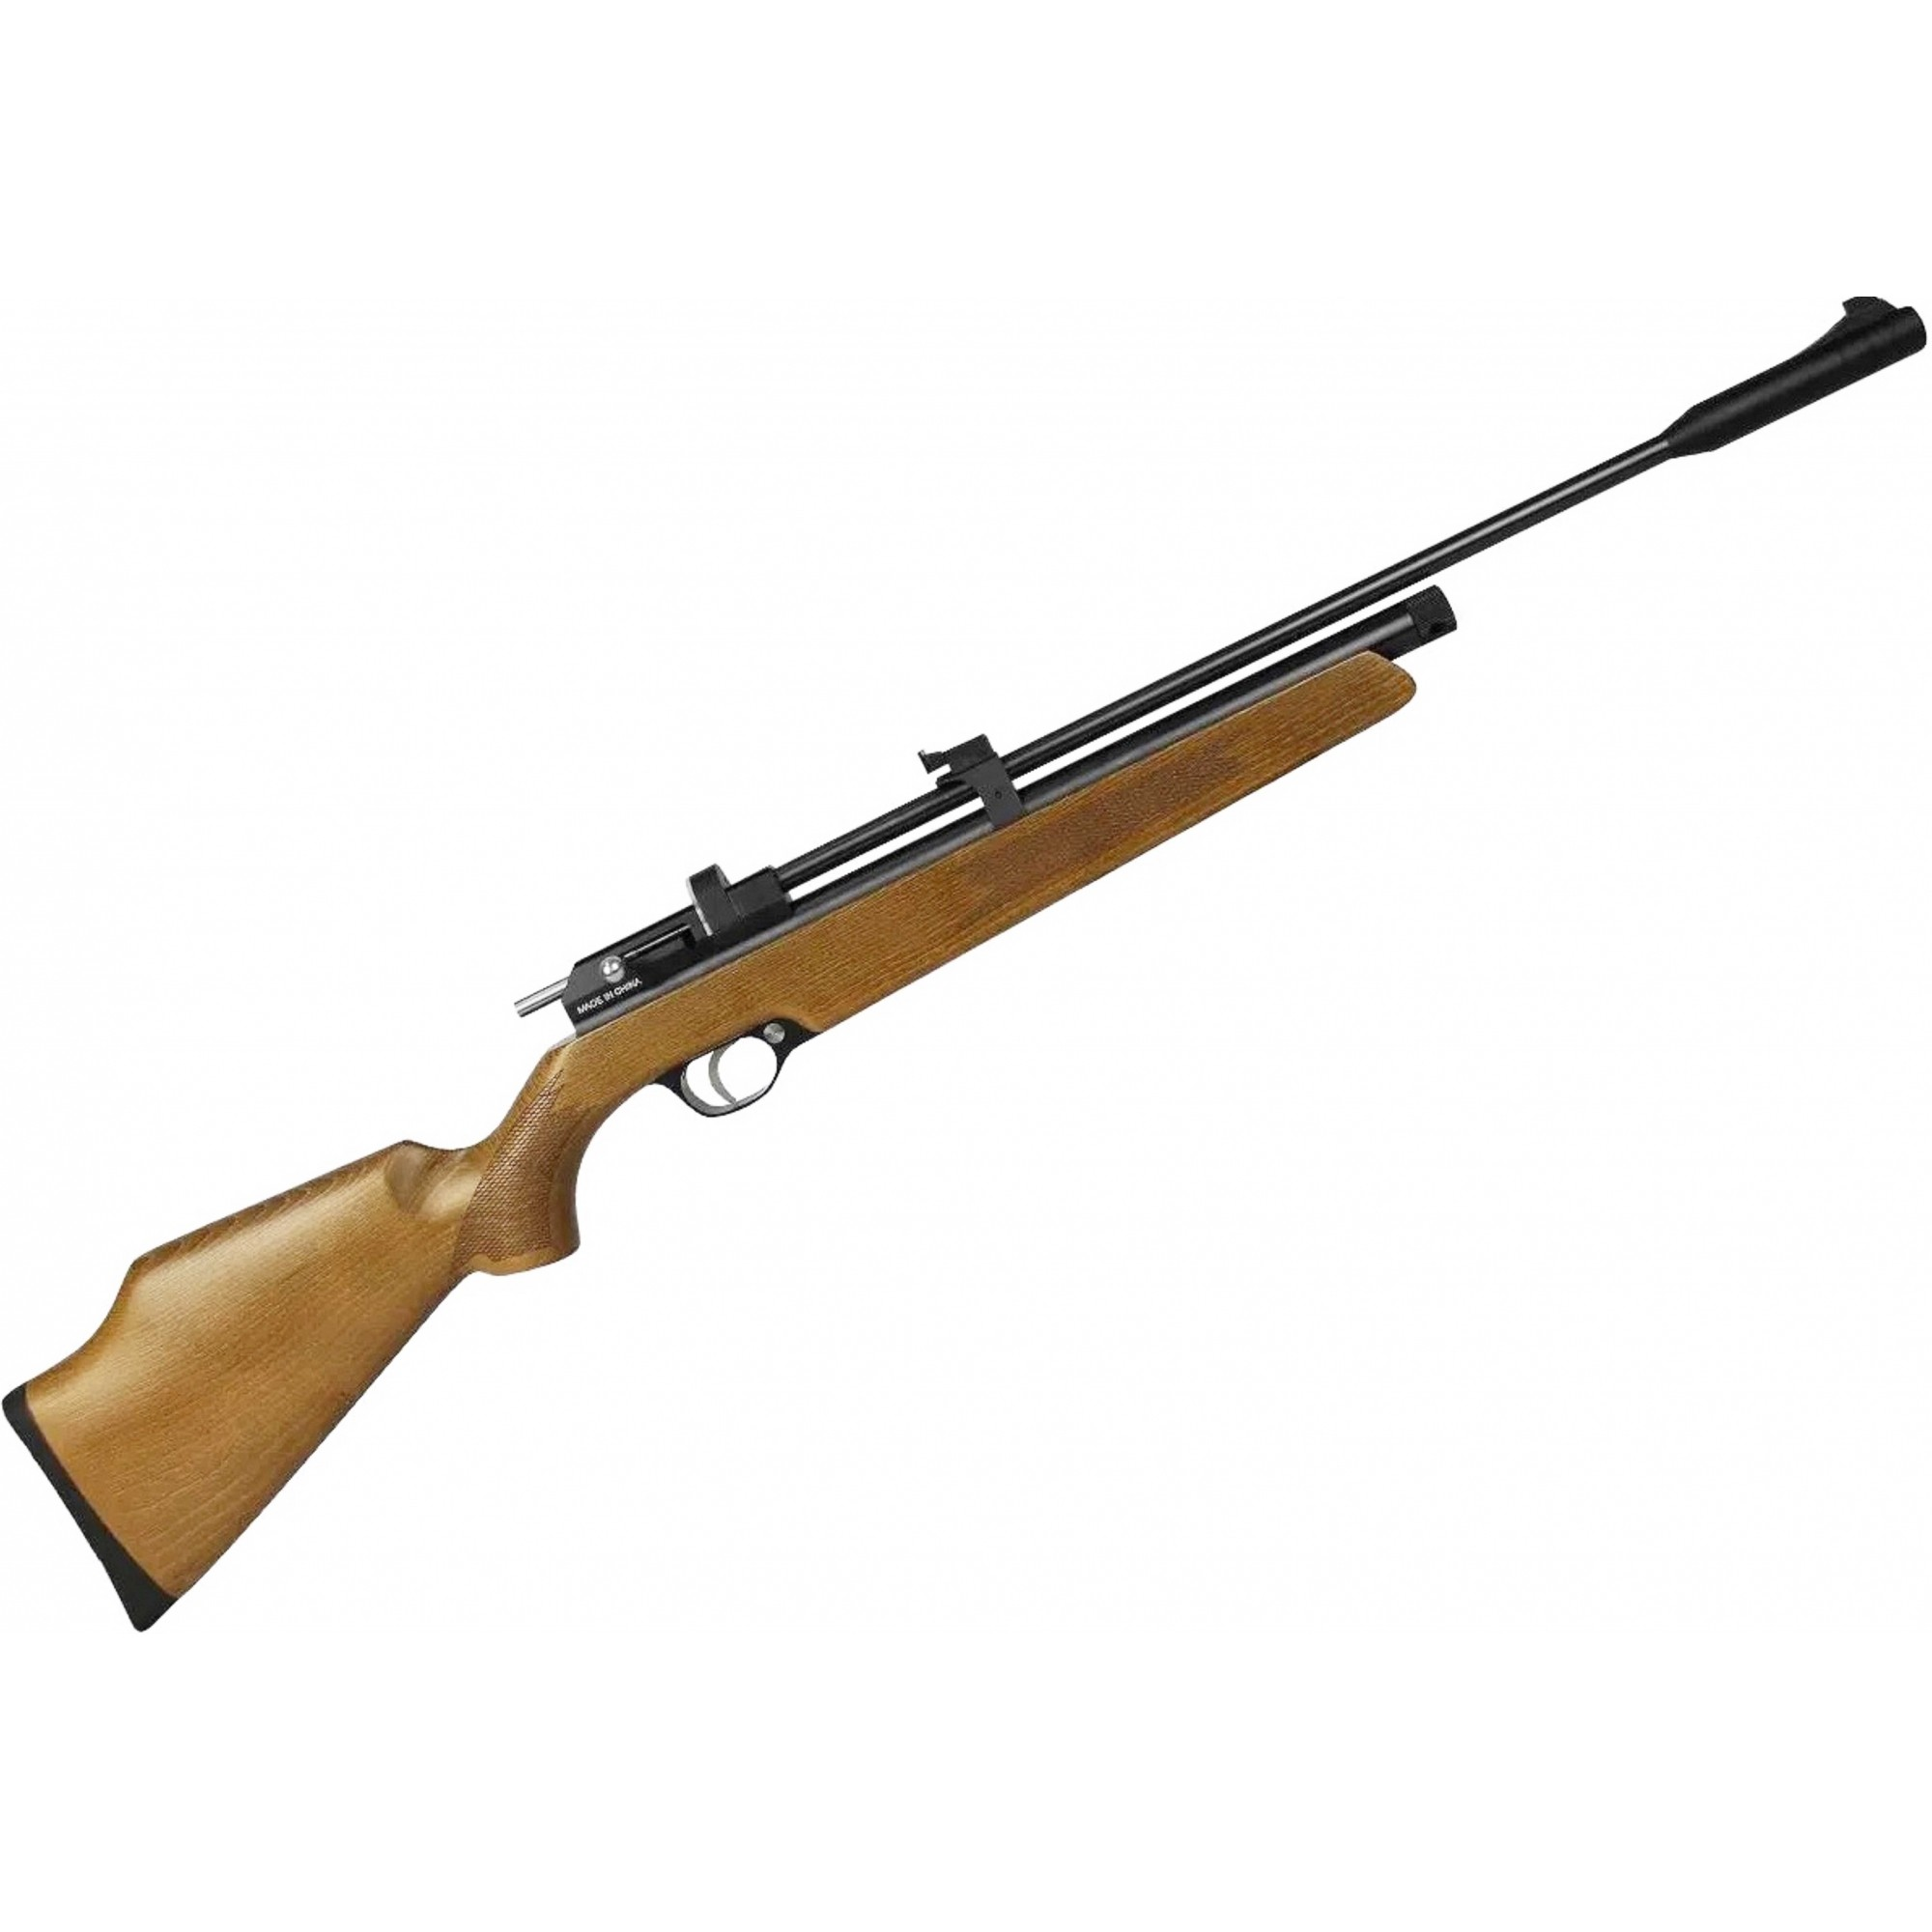 Carabina de Pressão Co2 Artemis 4.5mm CR600W